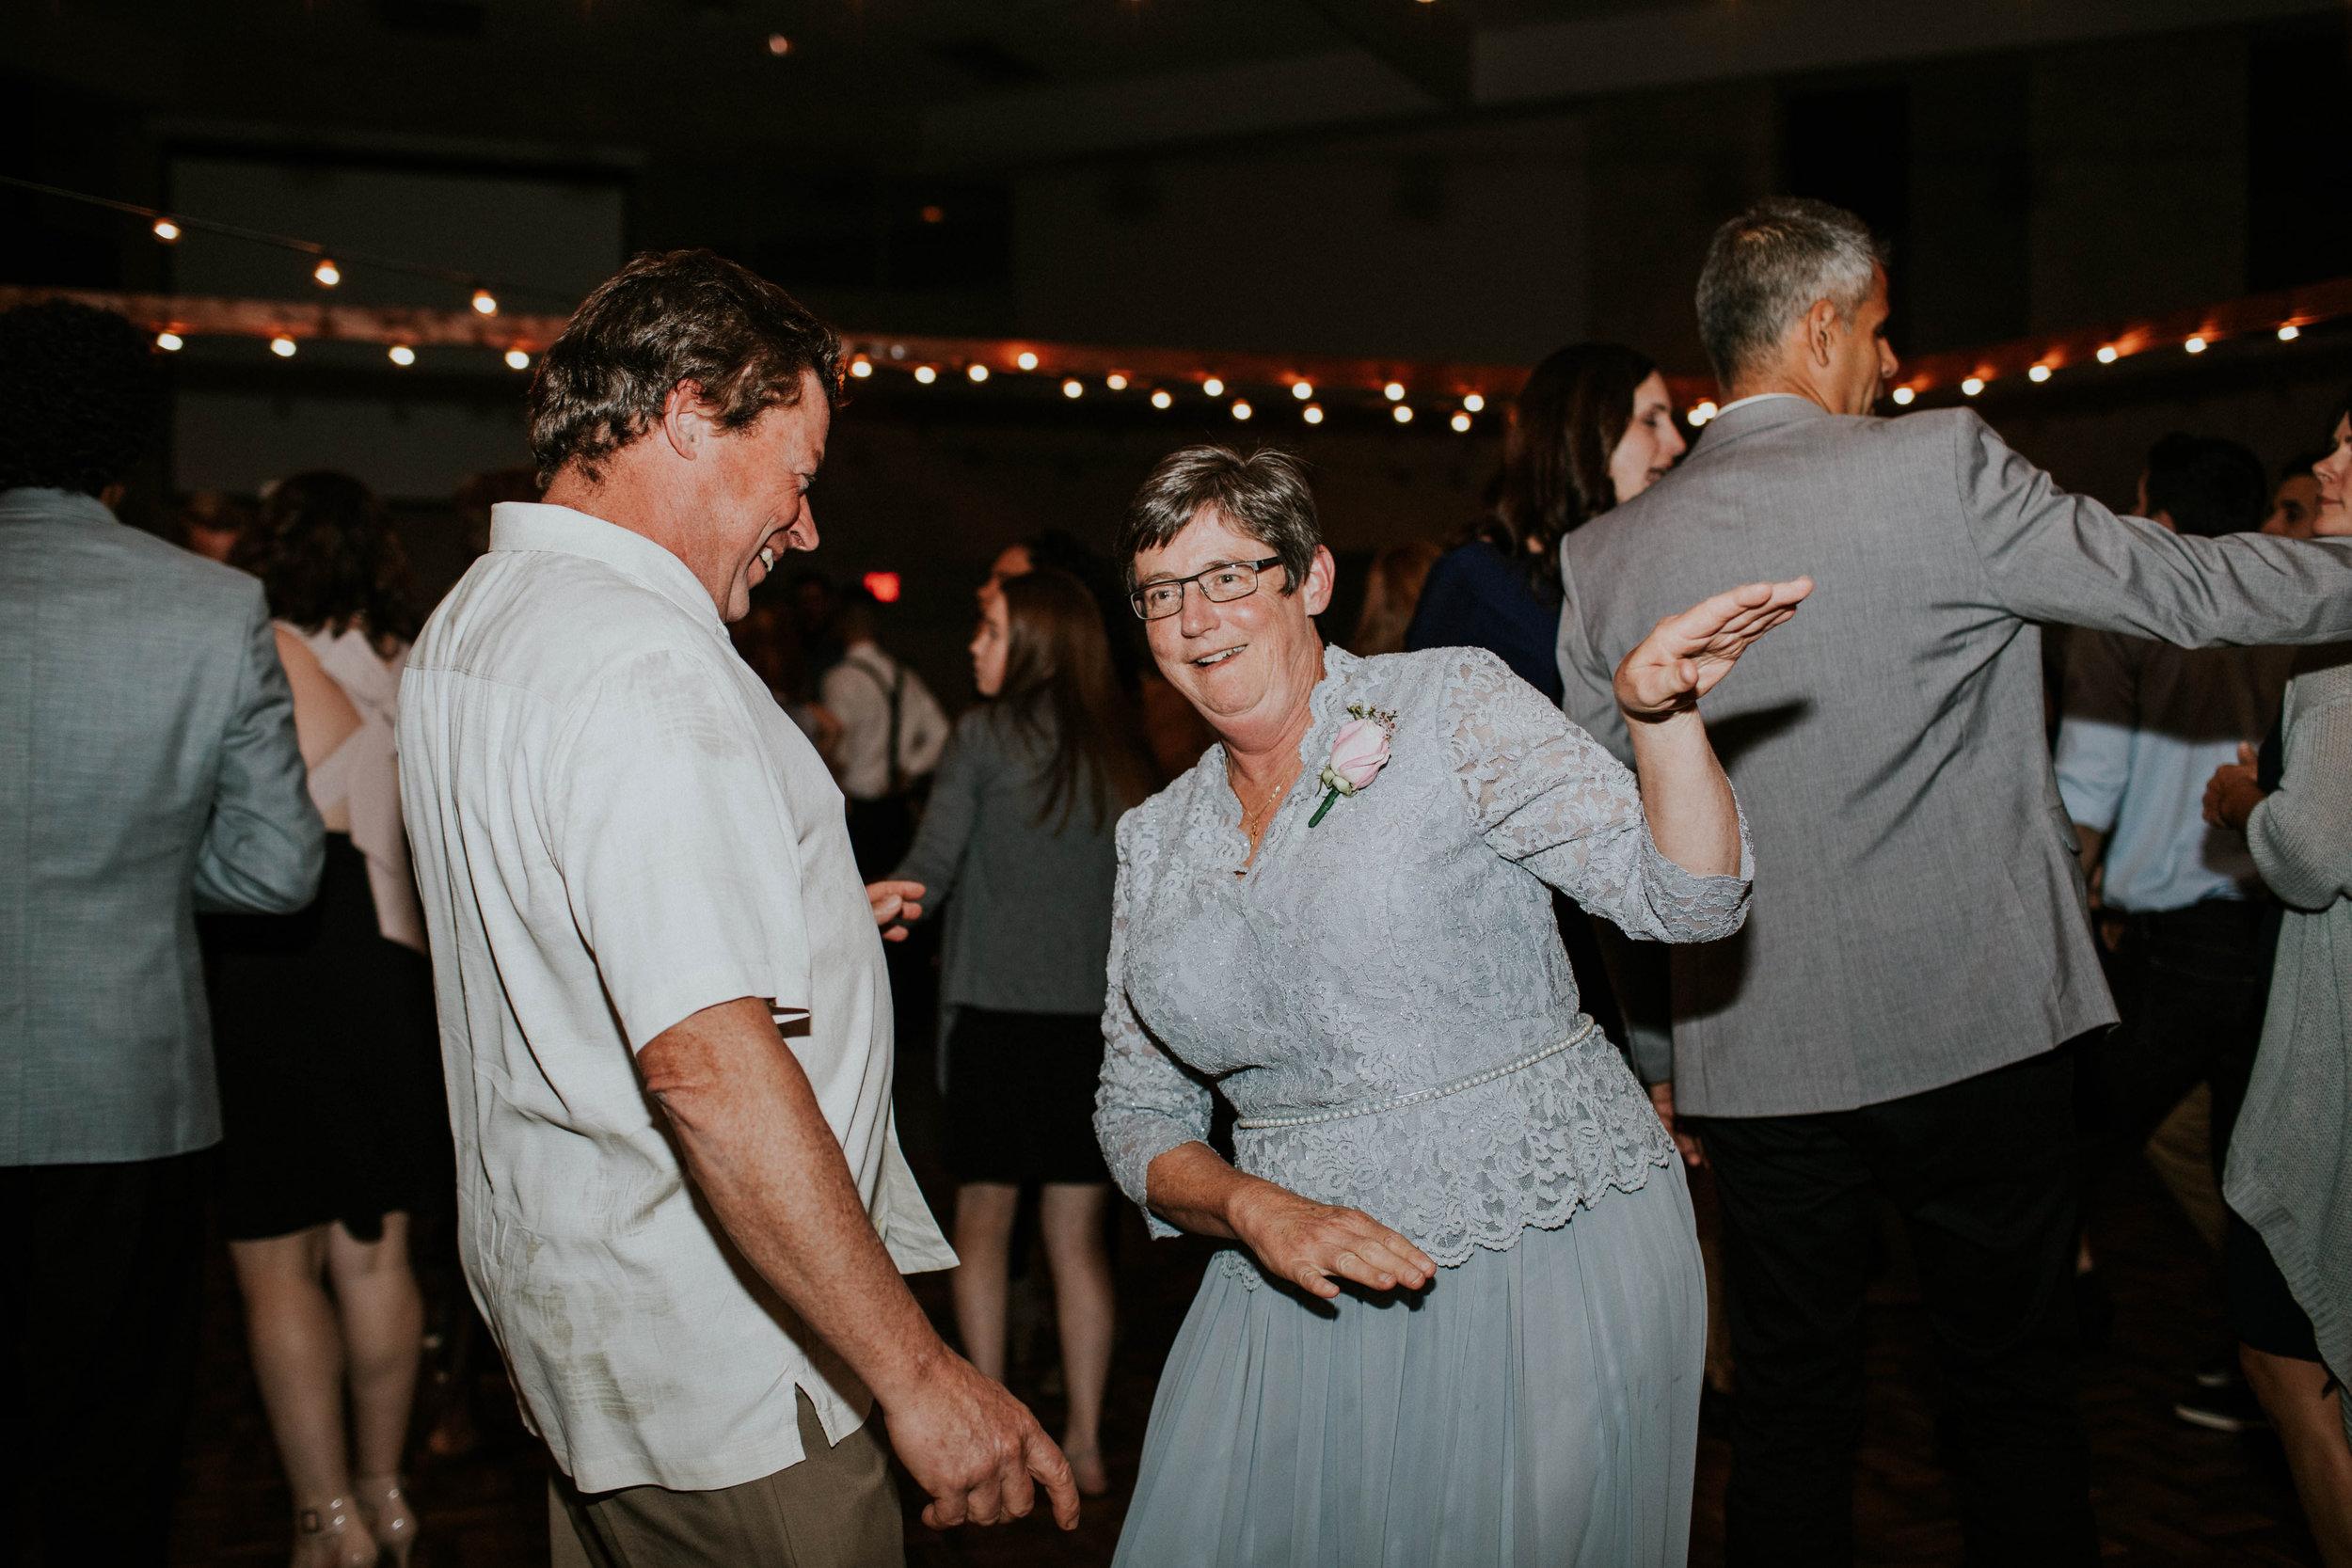 Columbus ohio wedding photographer grace e jones photography real fun joyful wedding173.jpg